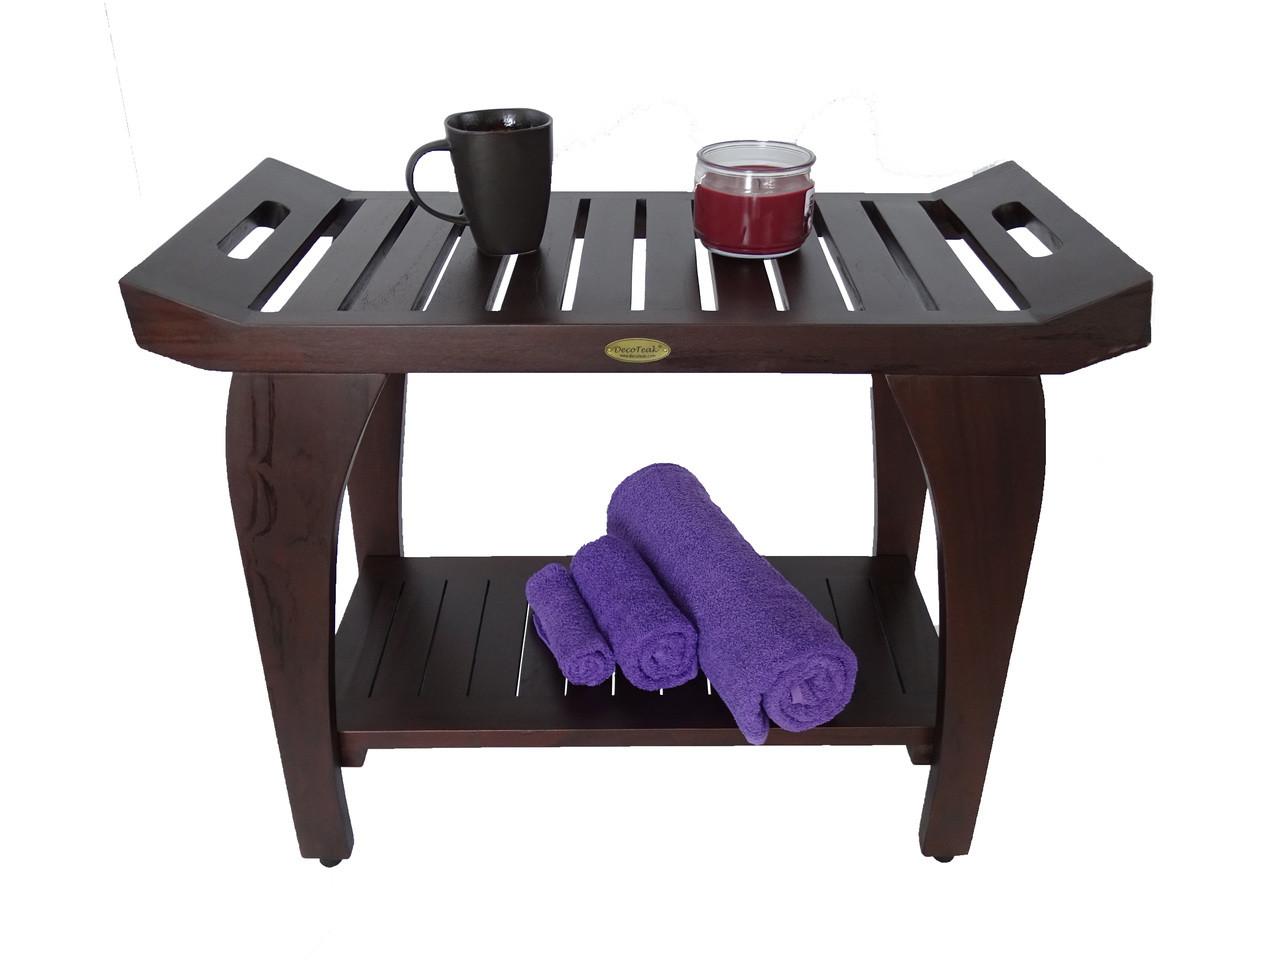 DecoTeak Tranquility™ 30 inch Teak Shower Bench - Extended Height